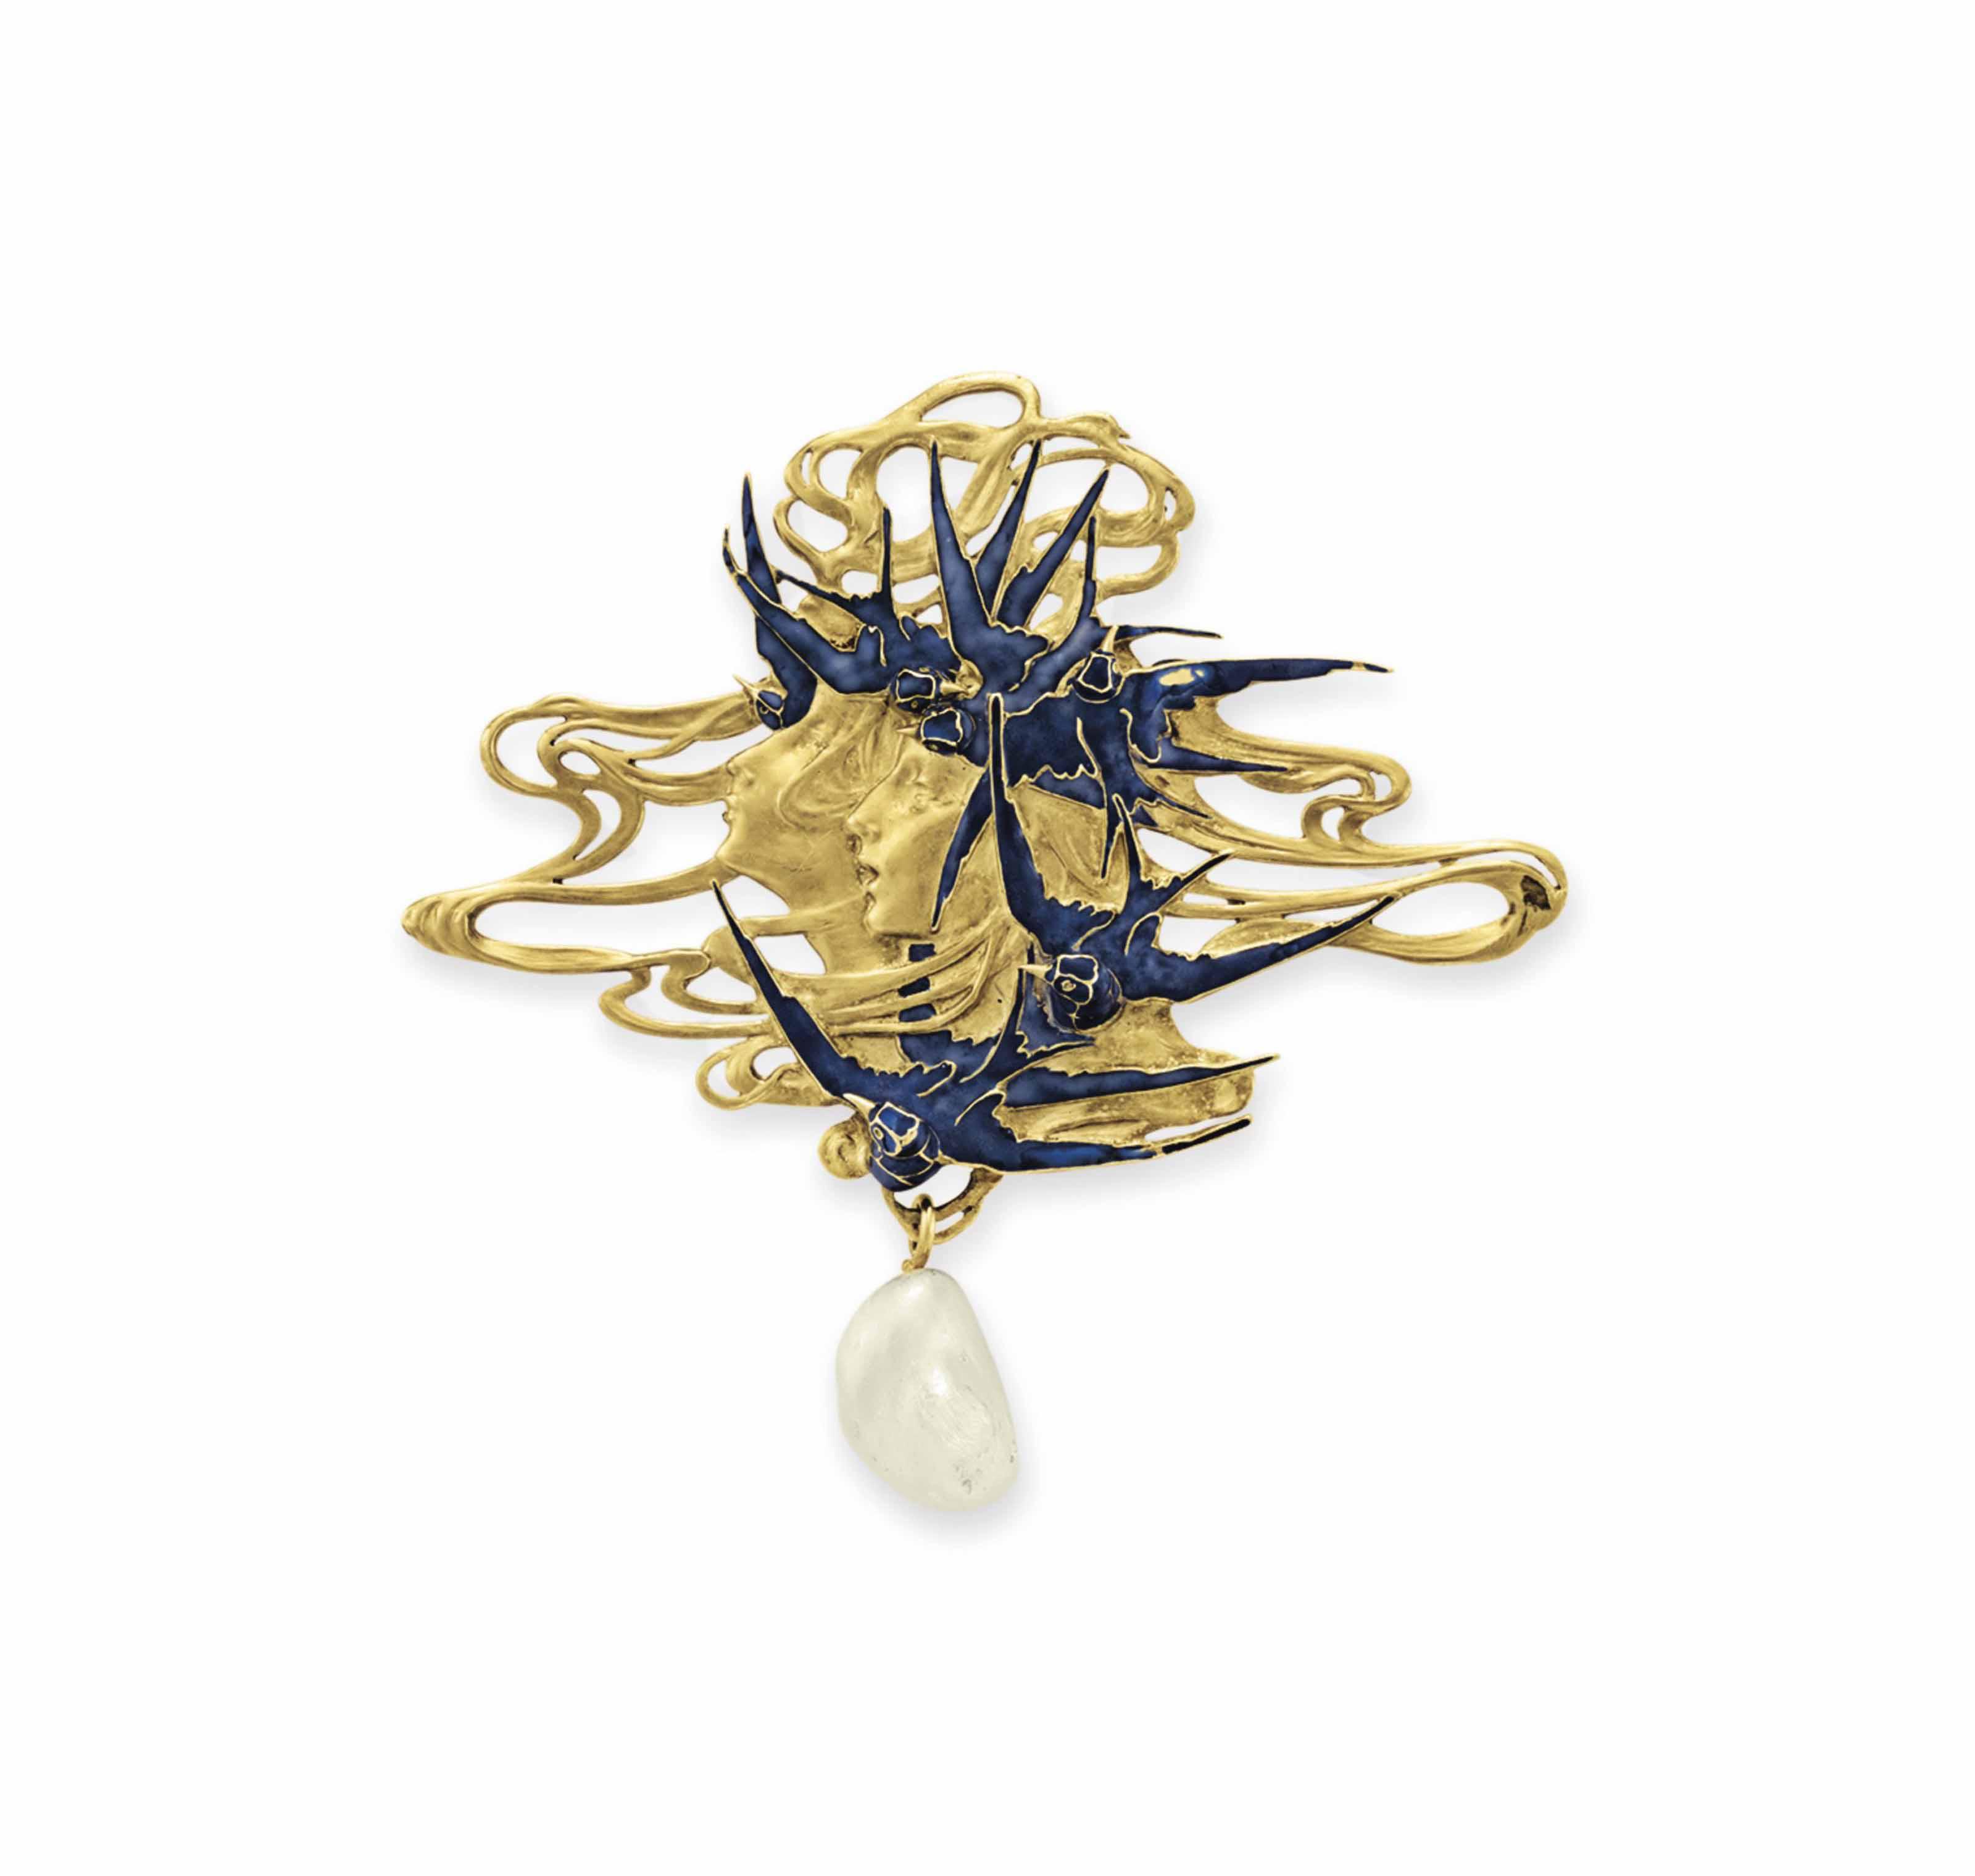 An Art Nouveau Gold Enamel And Pearl Brooch By Ren 201